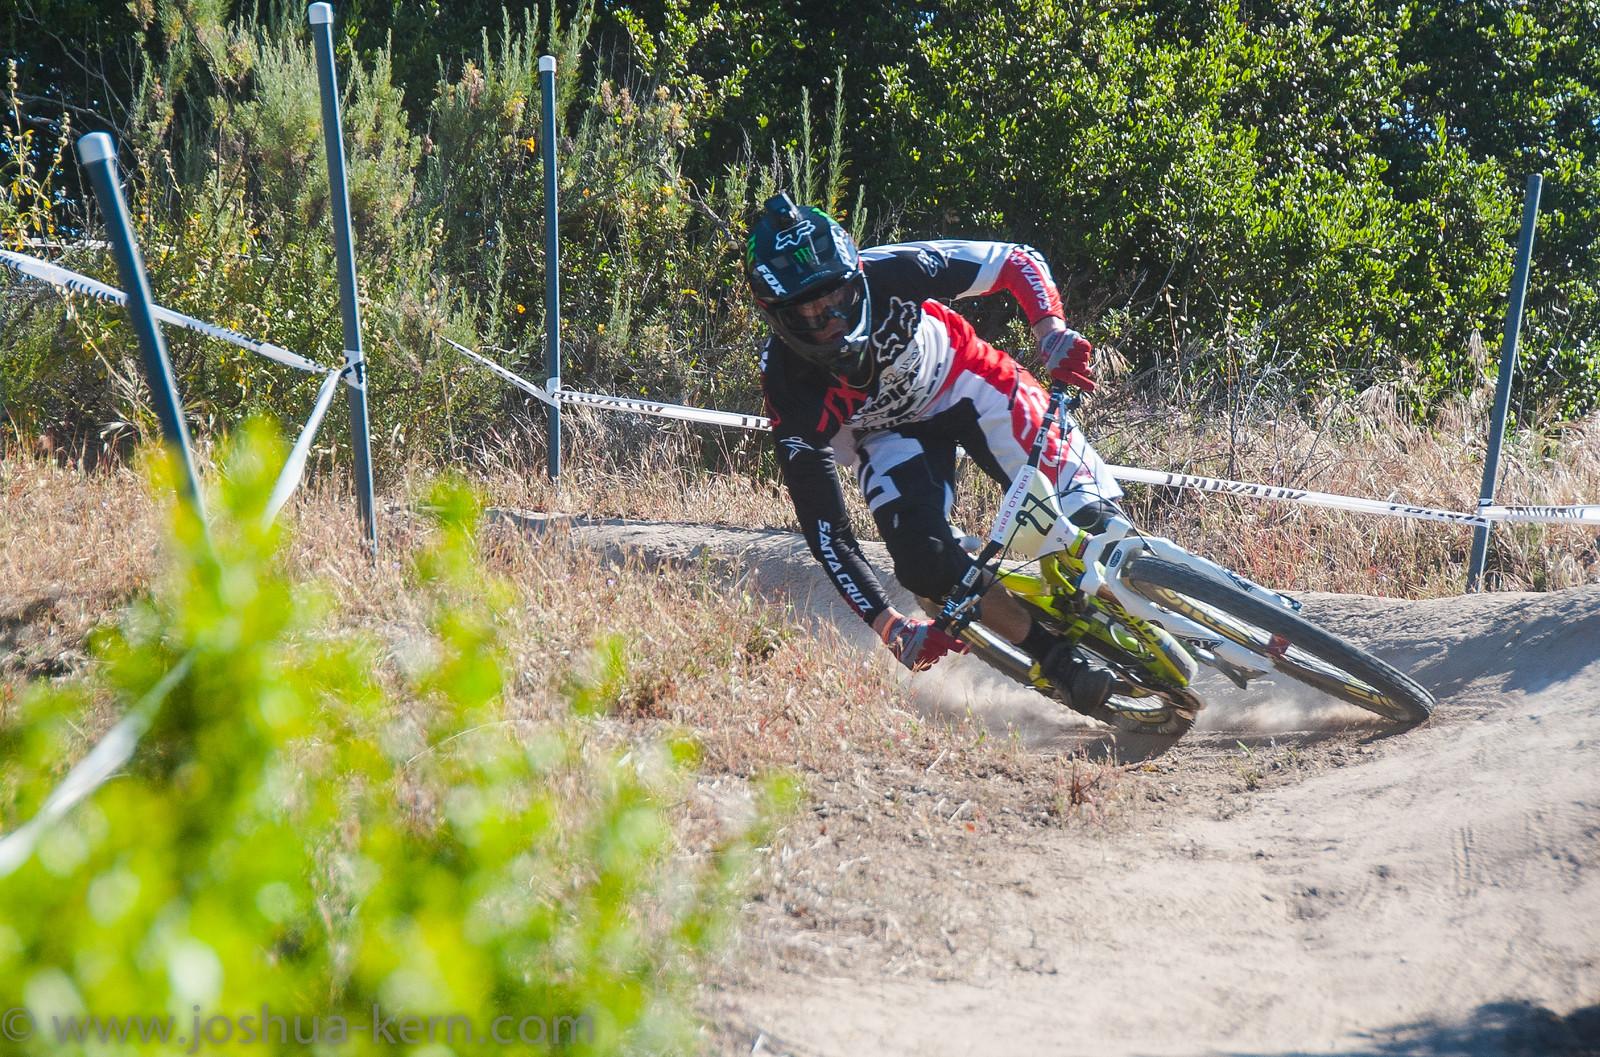 4-18-13DHPractice (11 of 17) - jkern620 - Mountain Biking Pictures - Vital MTB